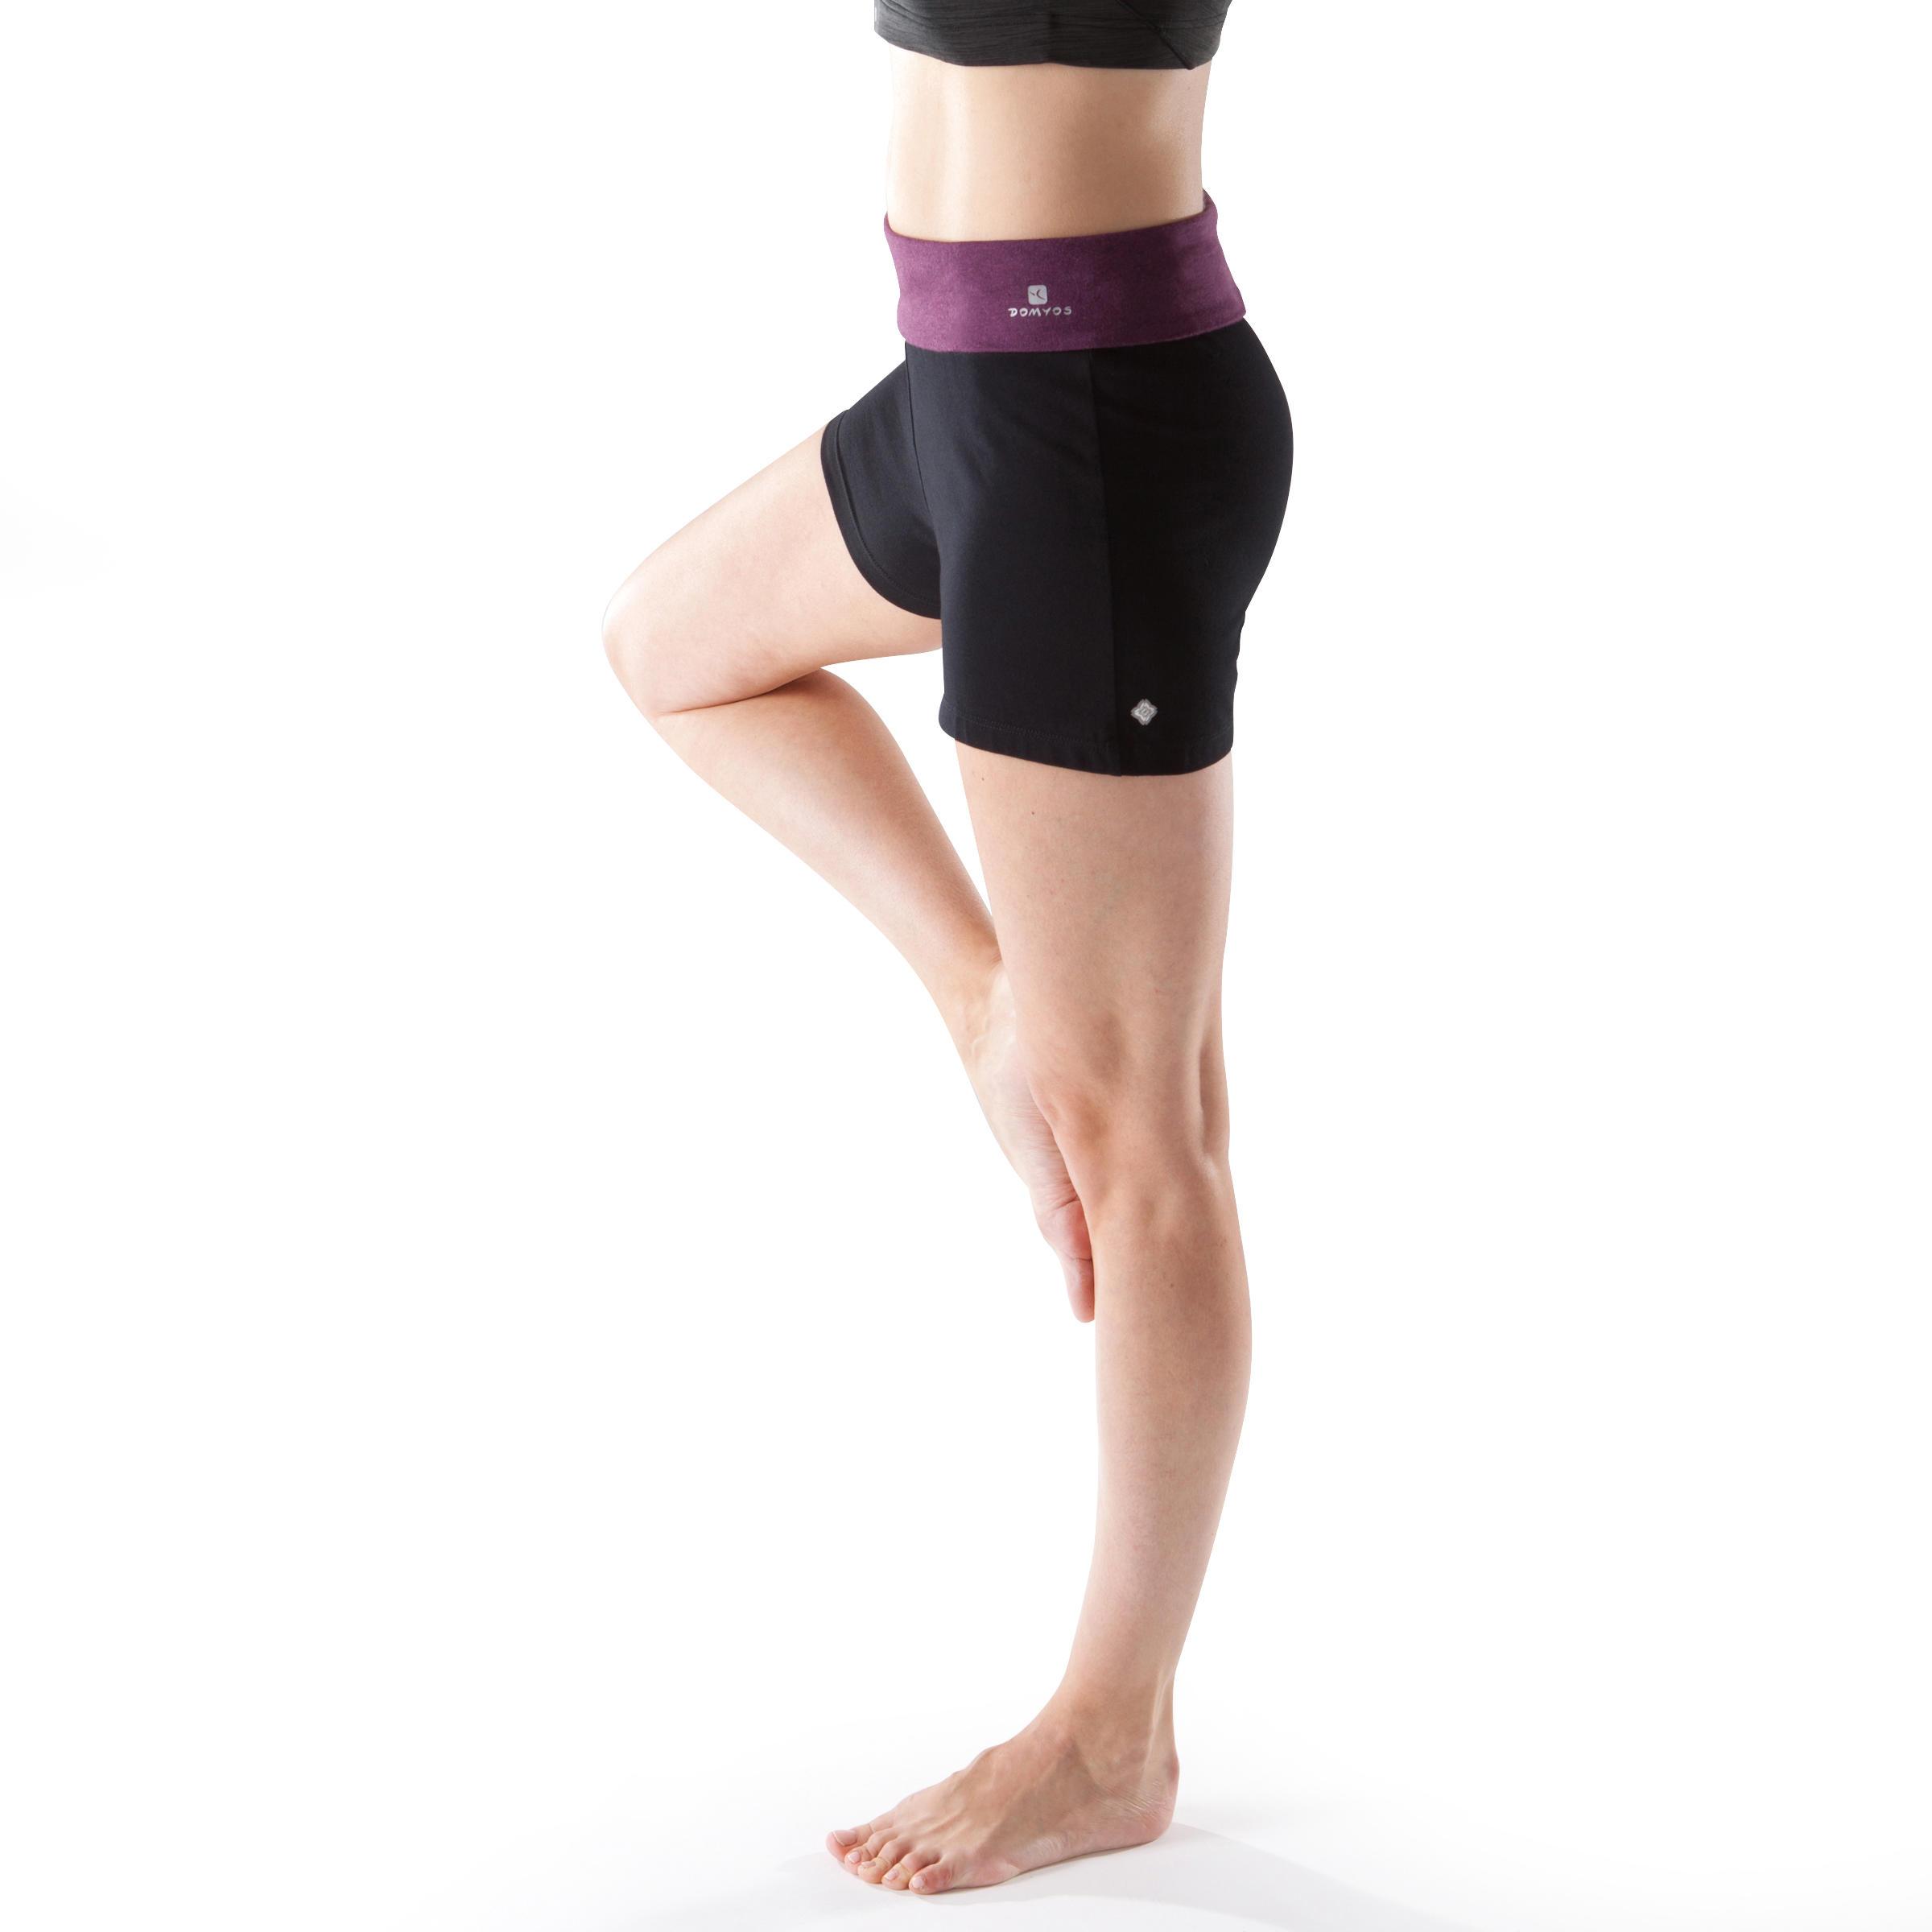 Women's Organic Cotton Yoga Shorts - Black/Mottled Burgundy